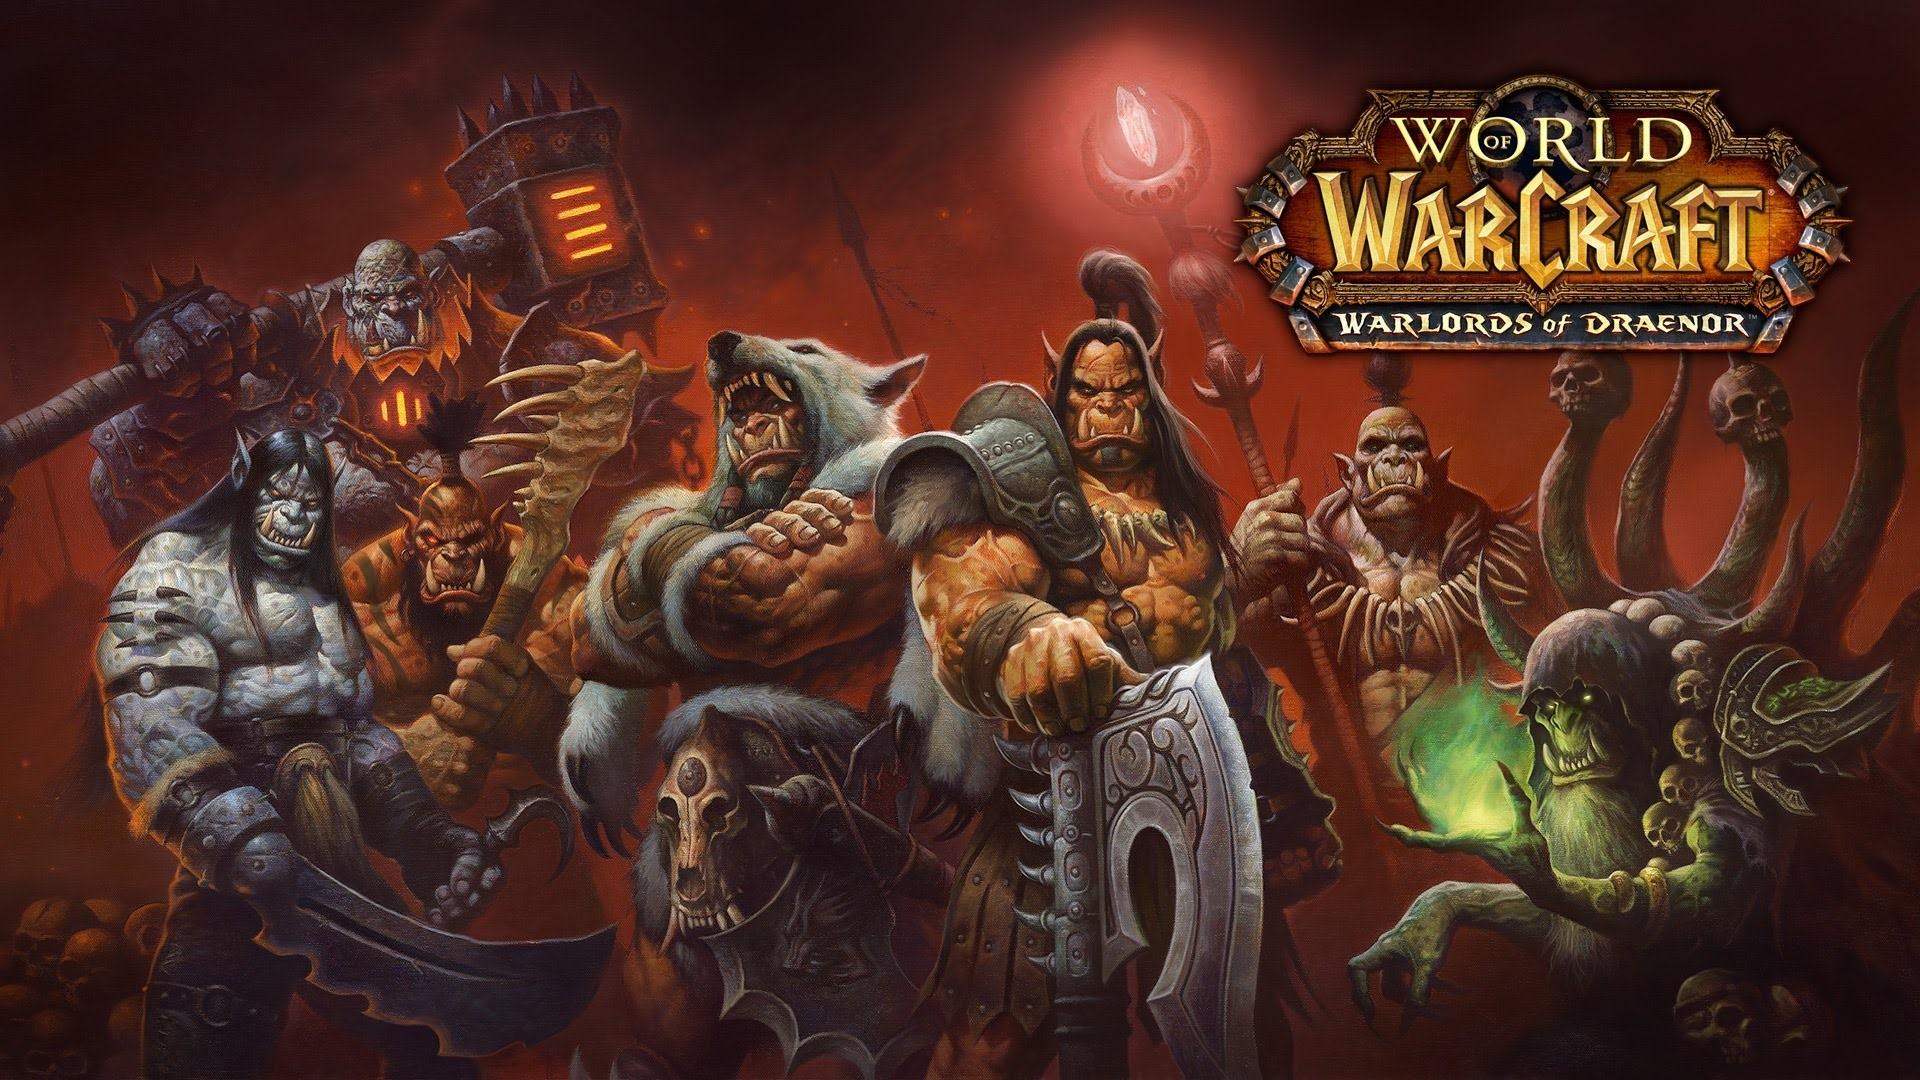 World of warcraft orc speak hentai movies